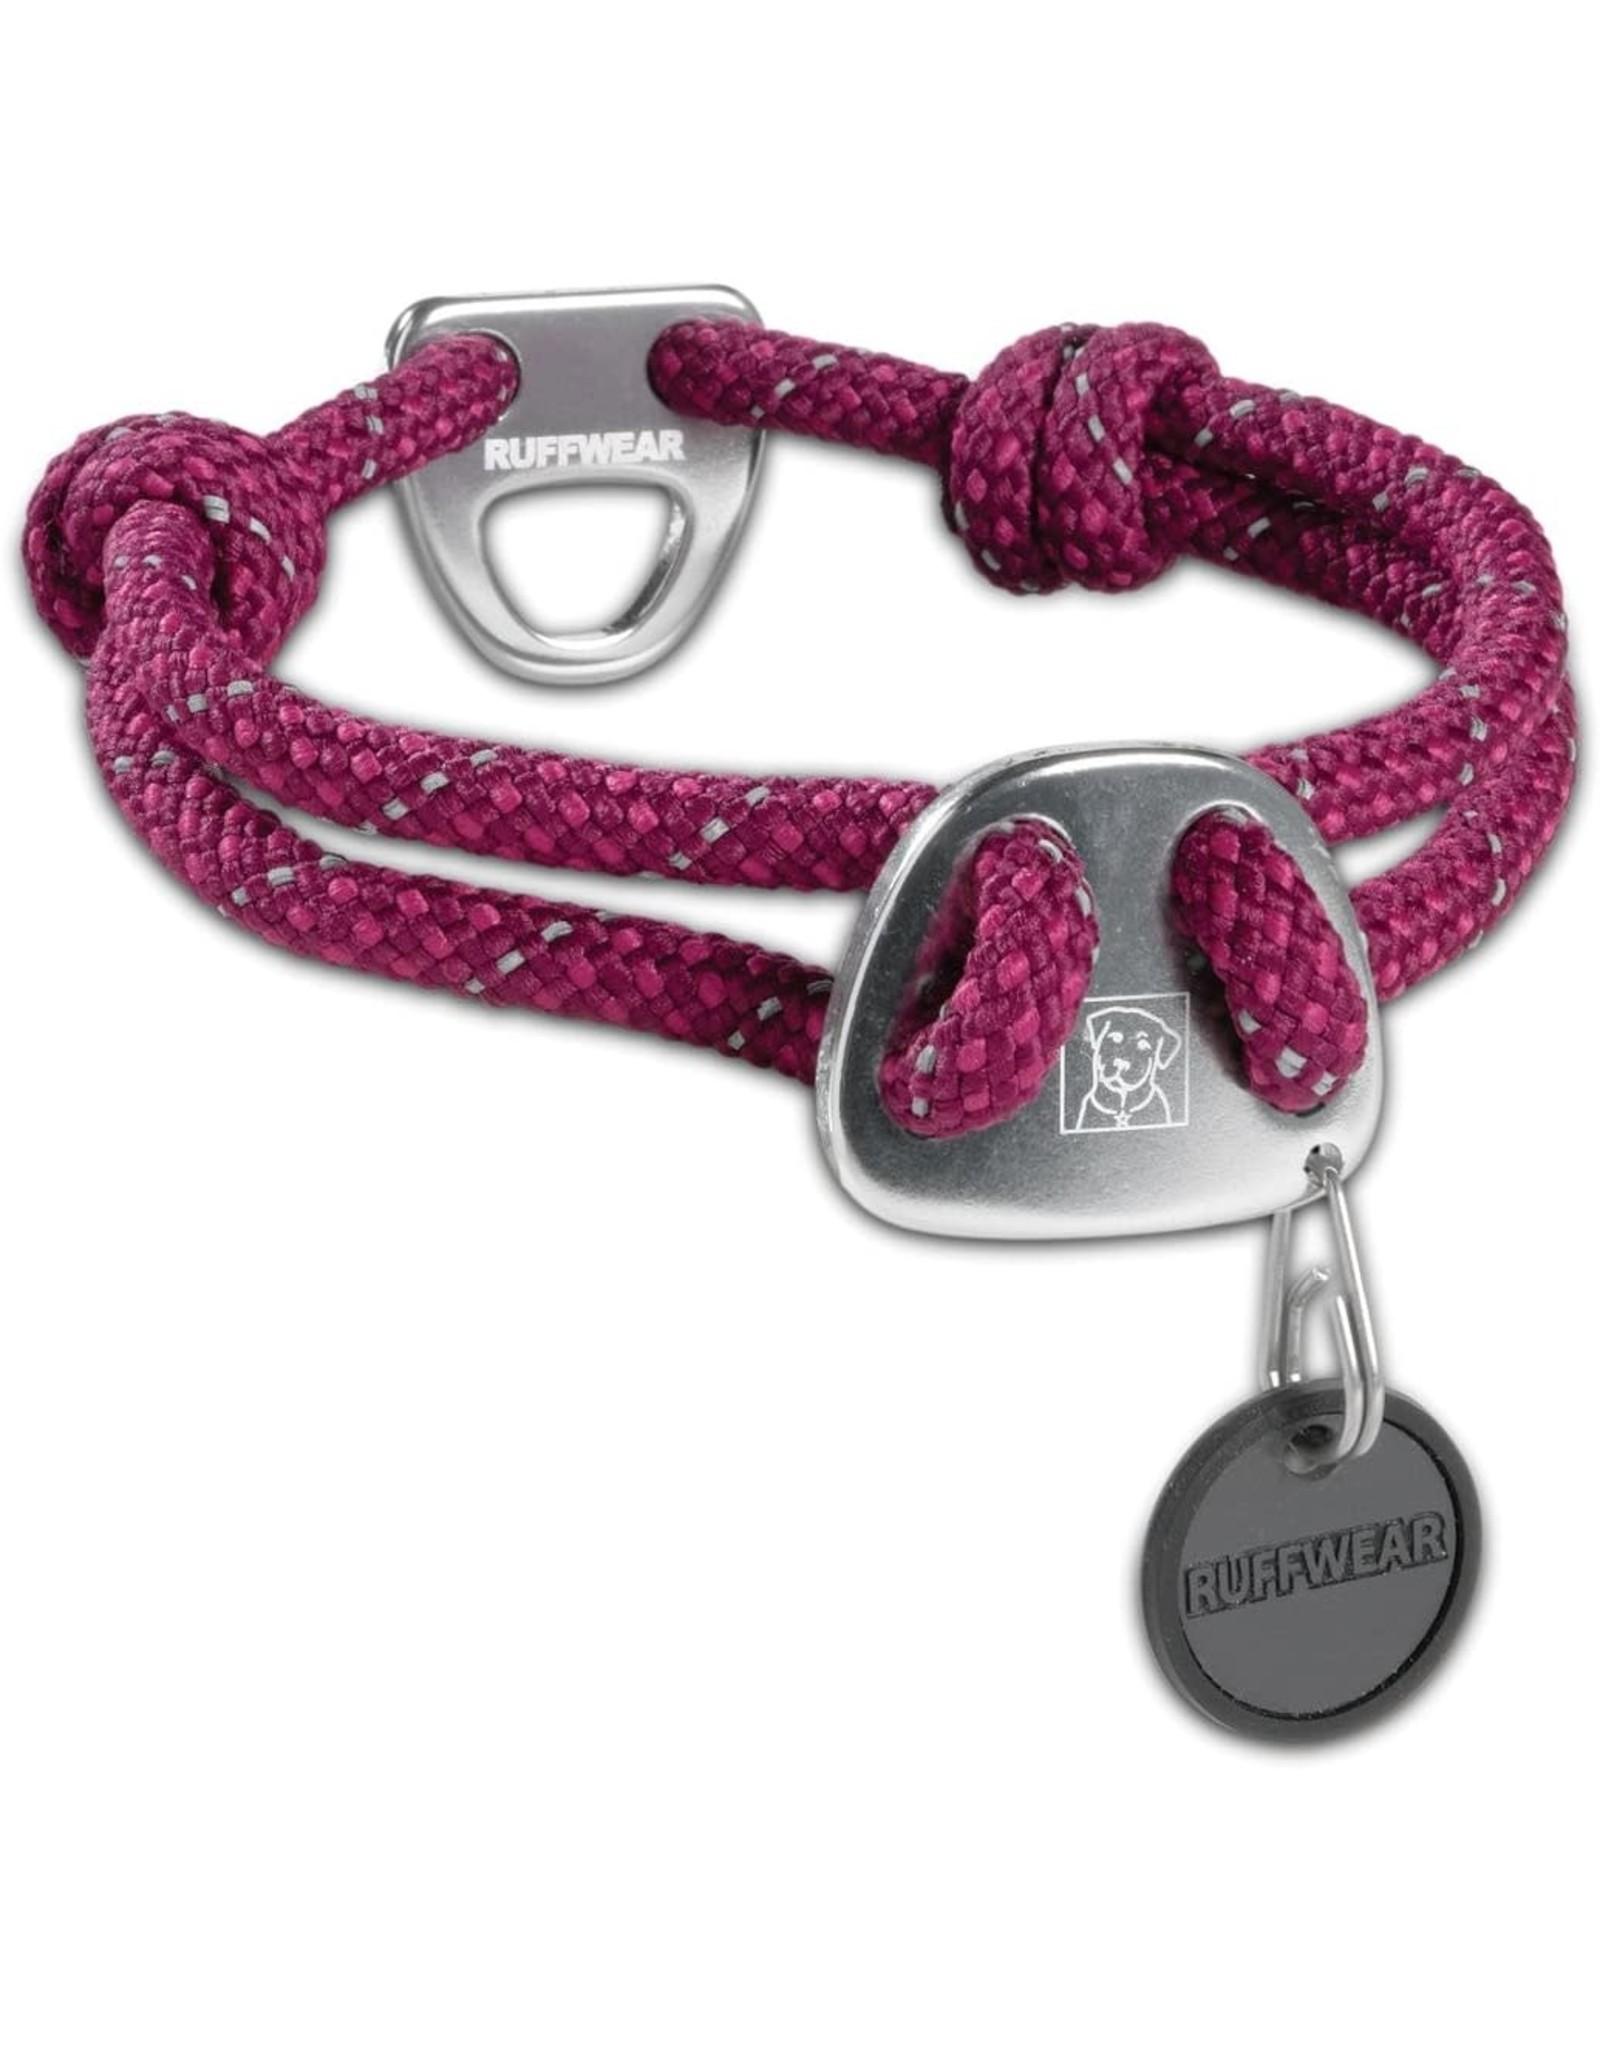 Knot-a-Collar: Purple Dusk, L